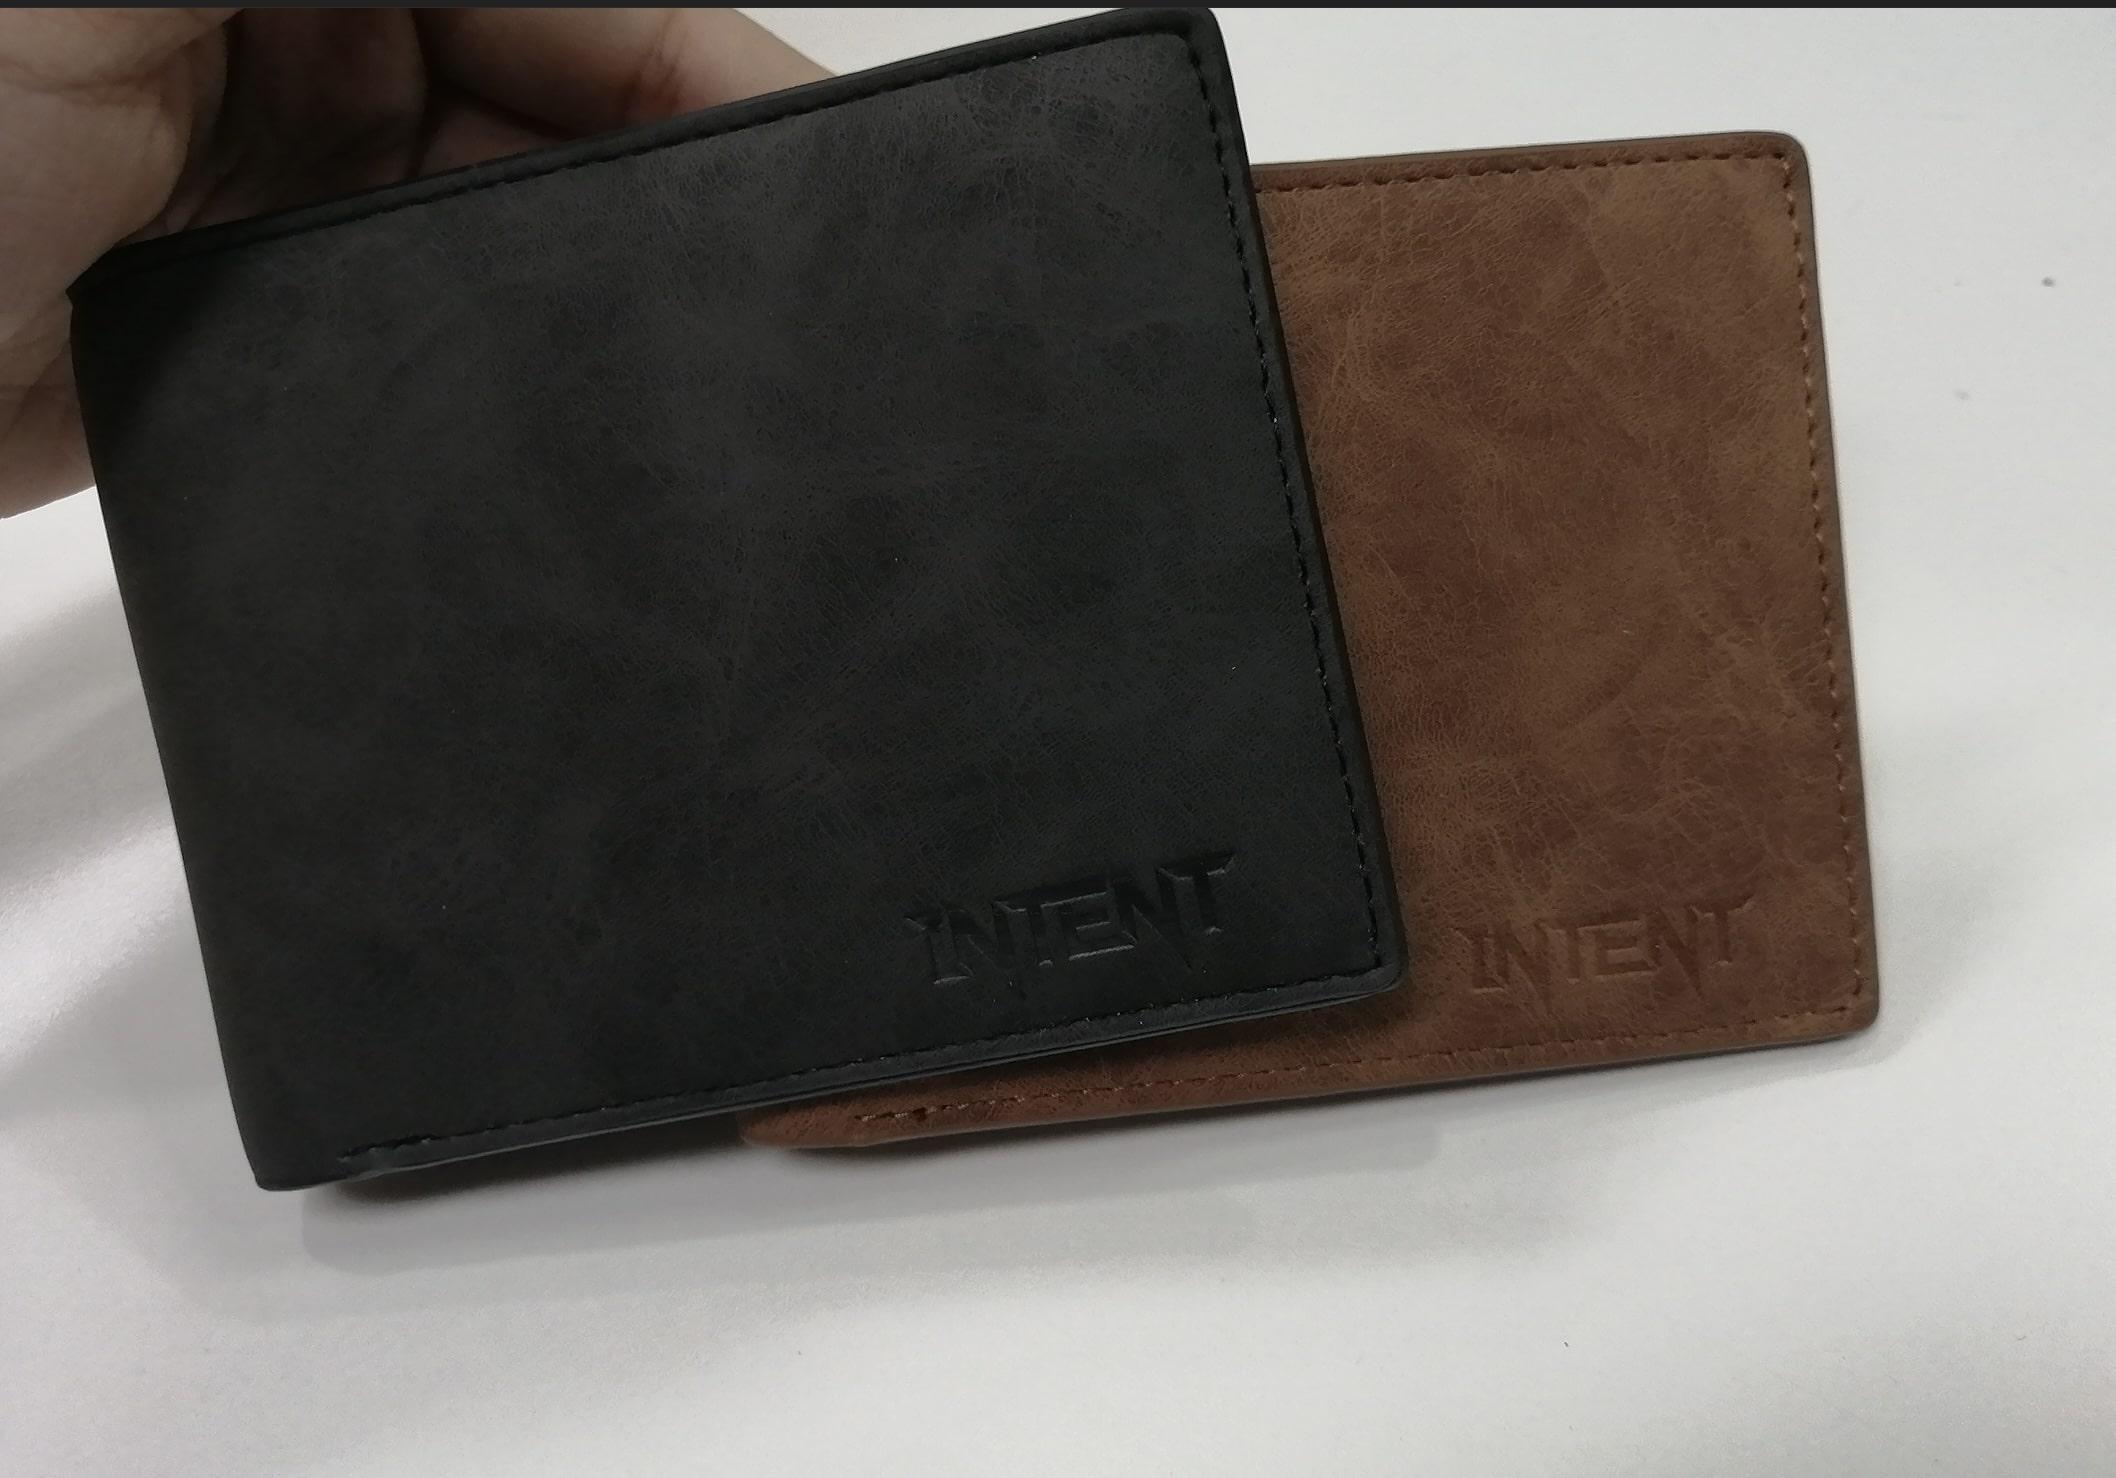 Intent Mx CC Legacy Wallet – Charcoal Grey